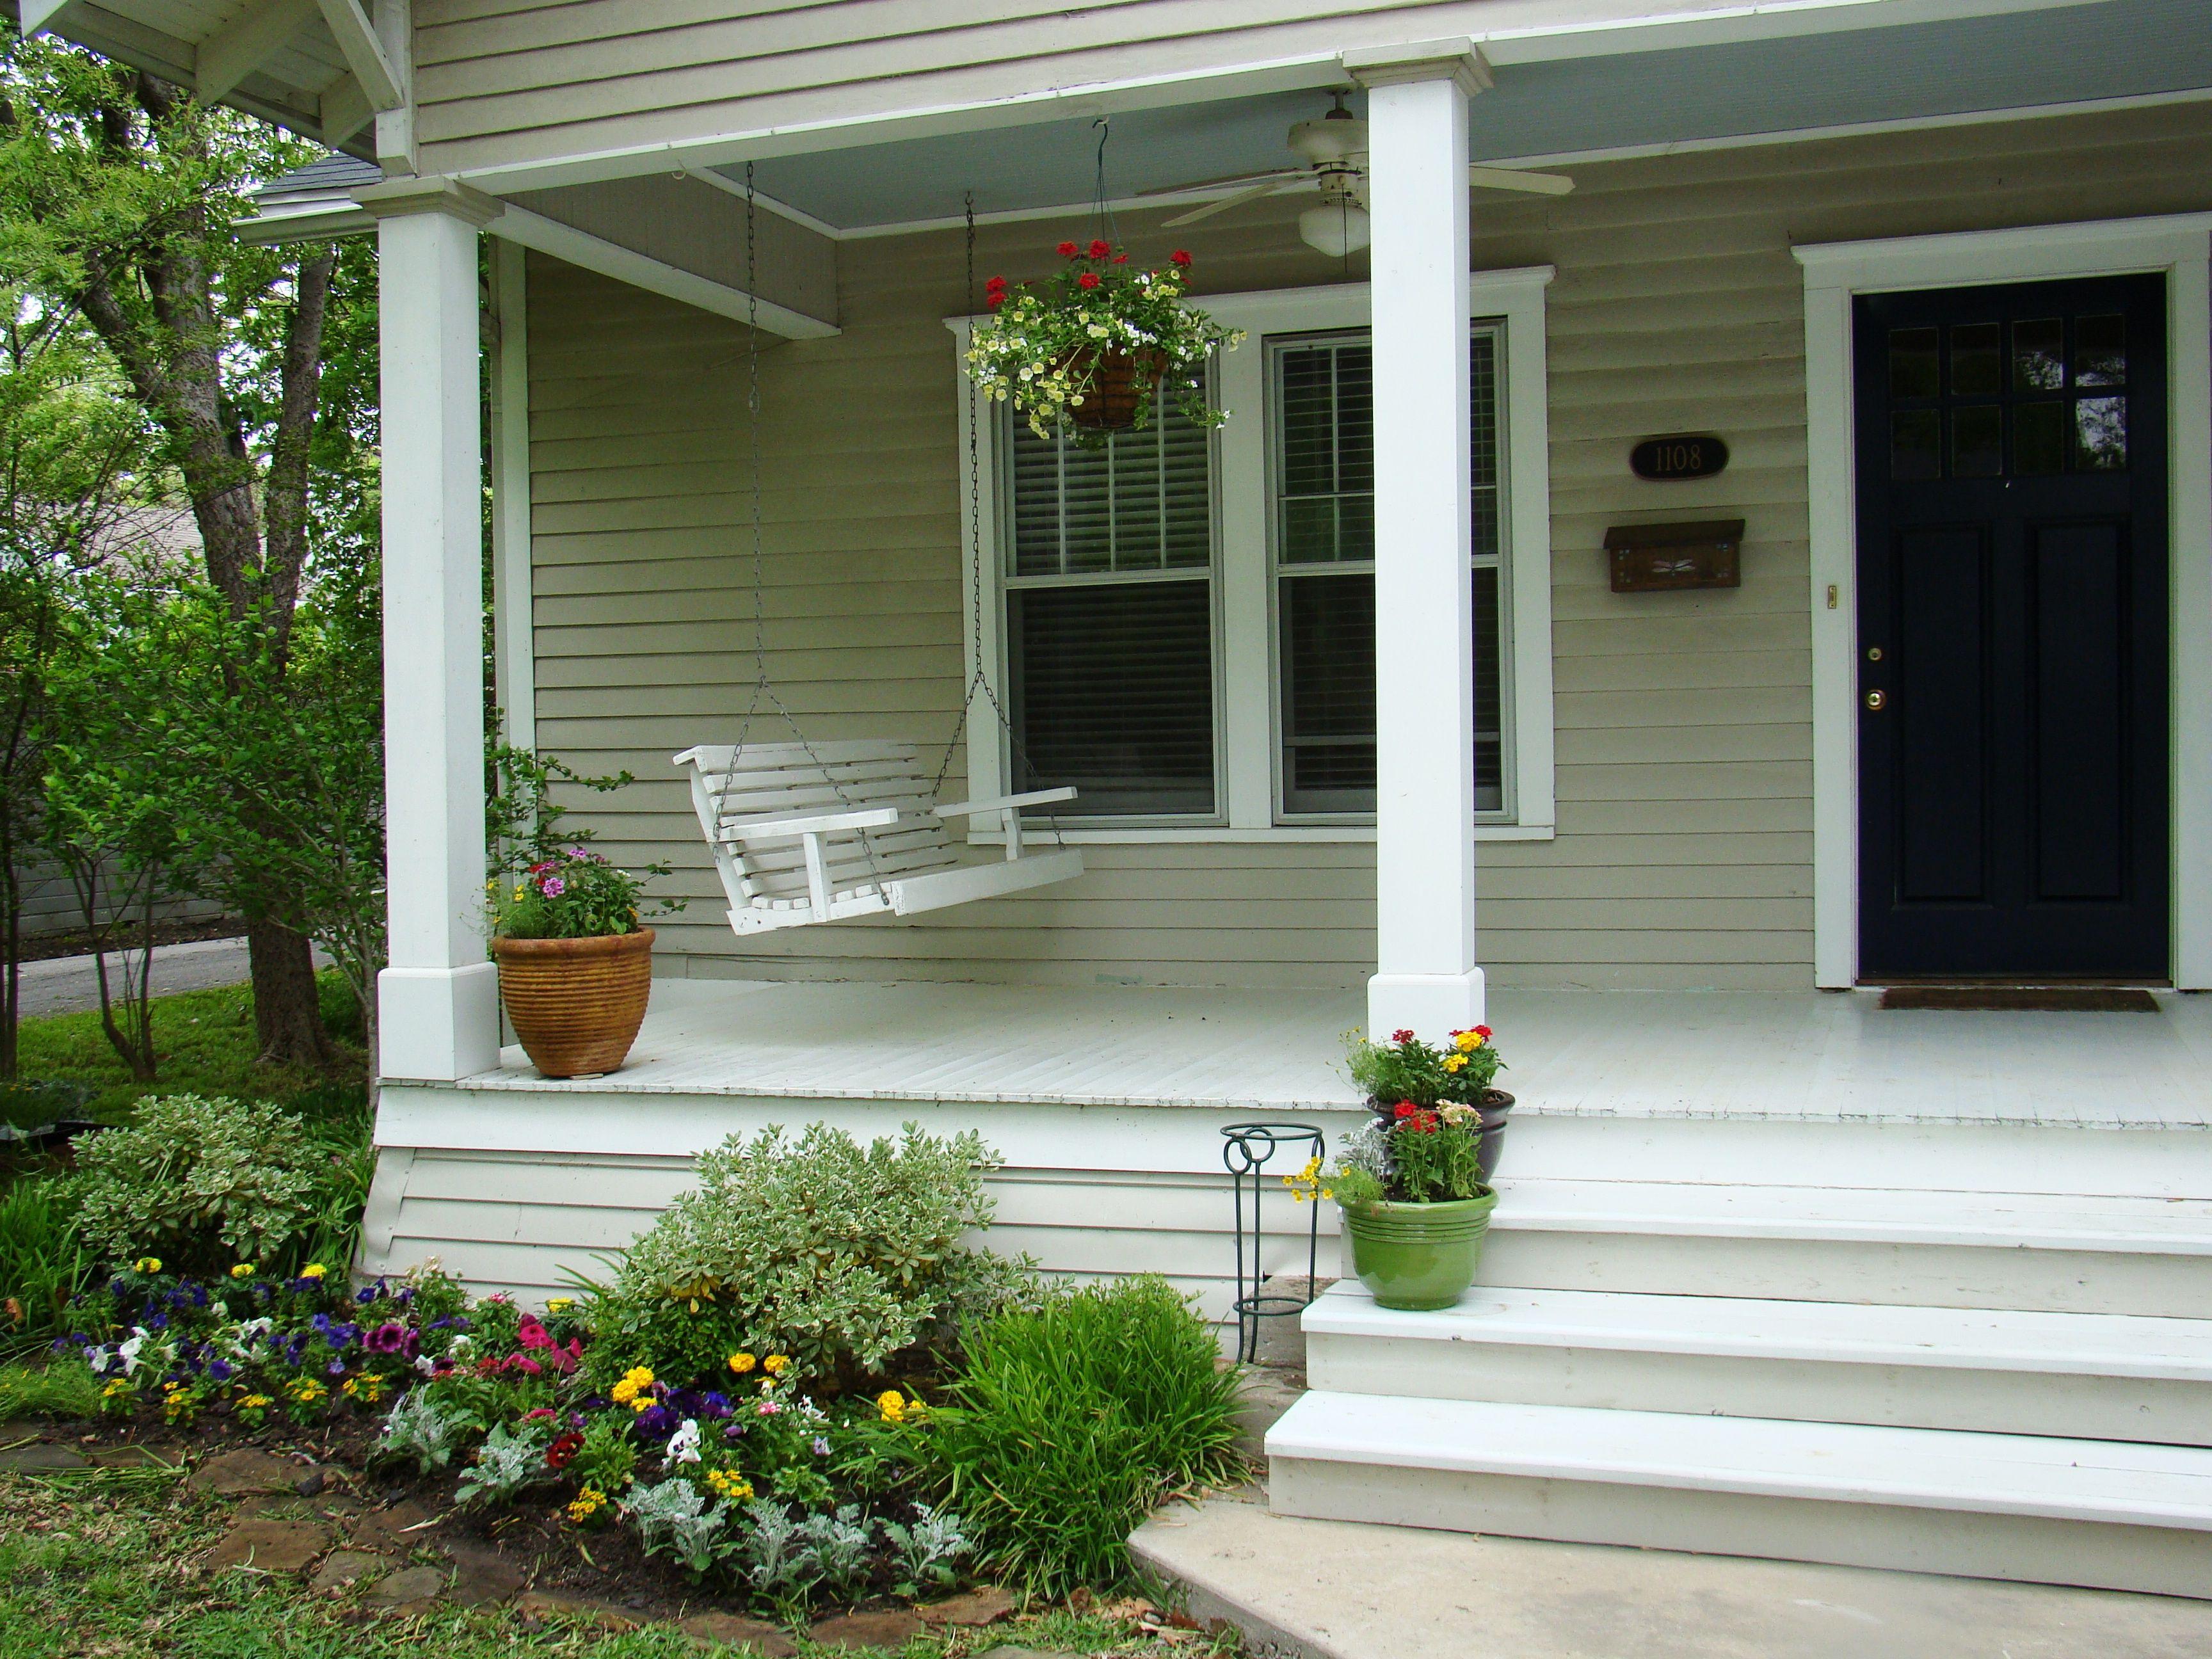 Front porch designs for houses - Front Porch Minimalist Front Porch Design With Beautiful Red Color Scheme Home Decoration Design